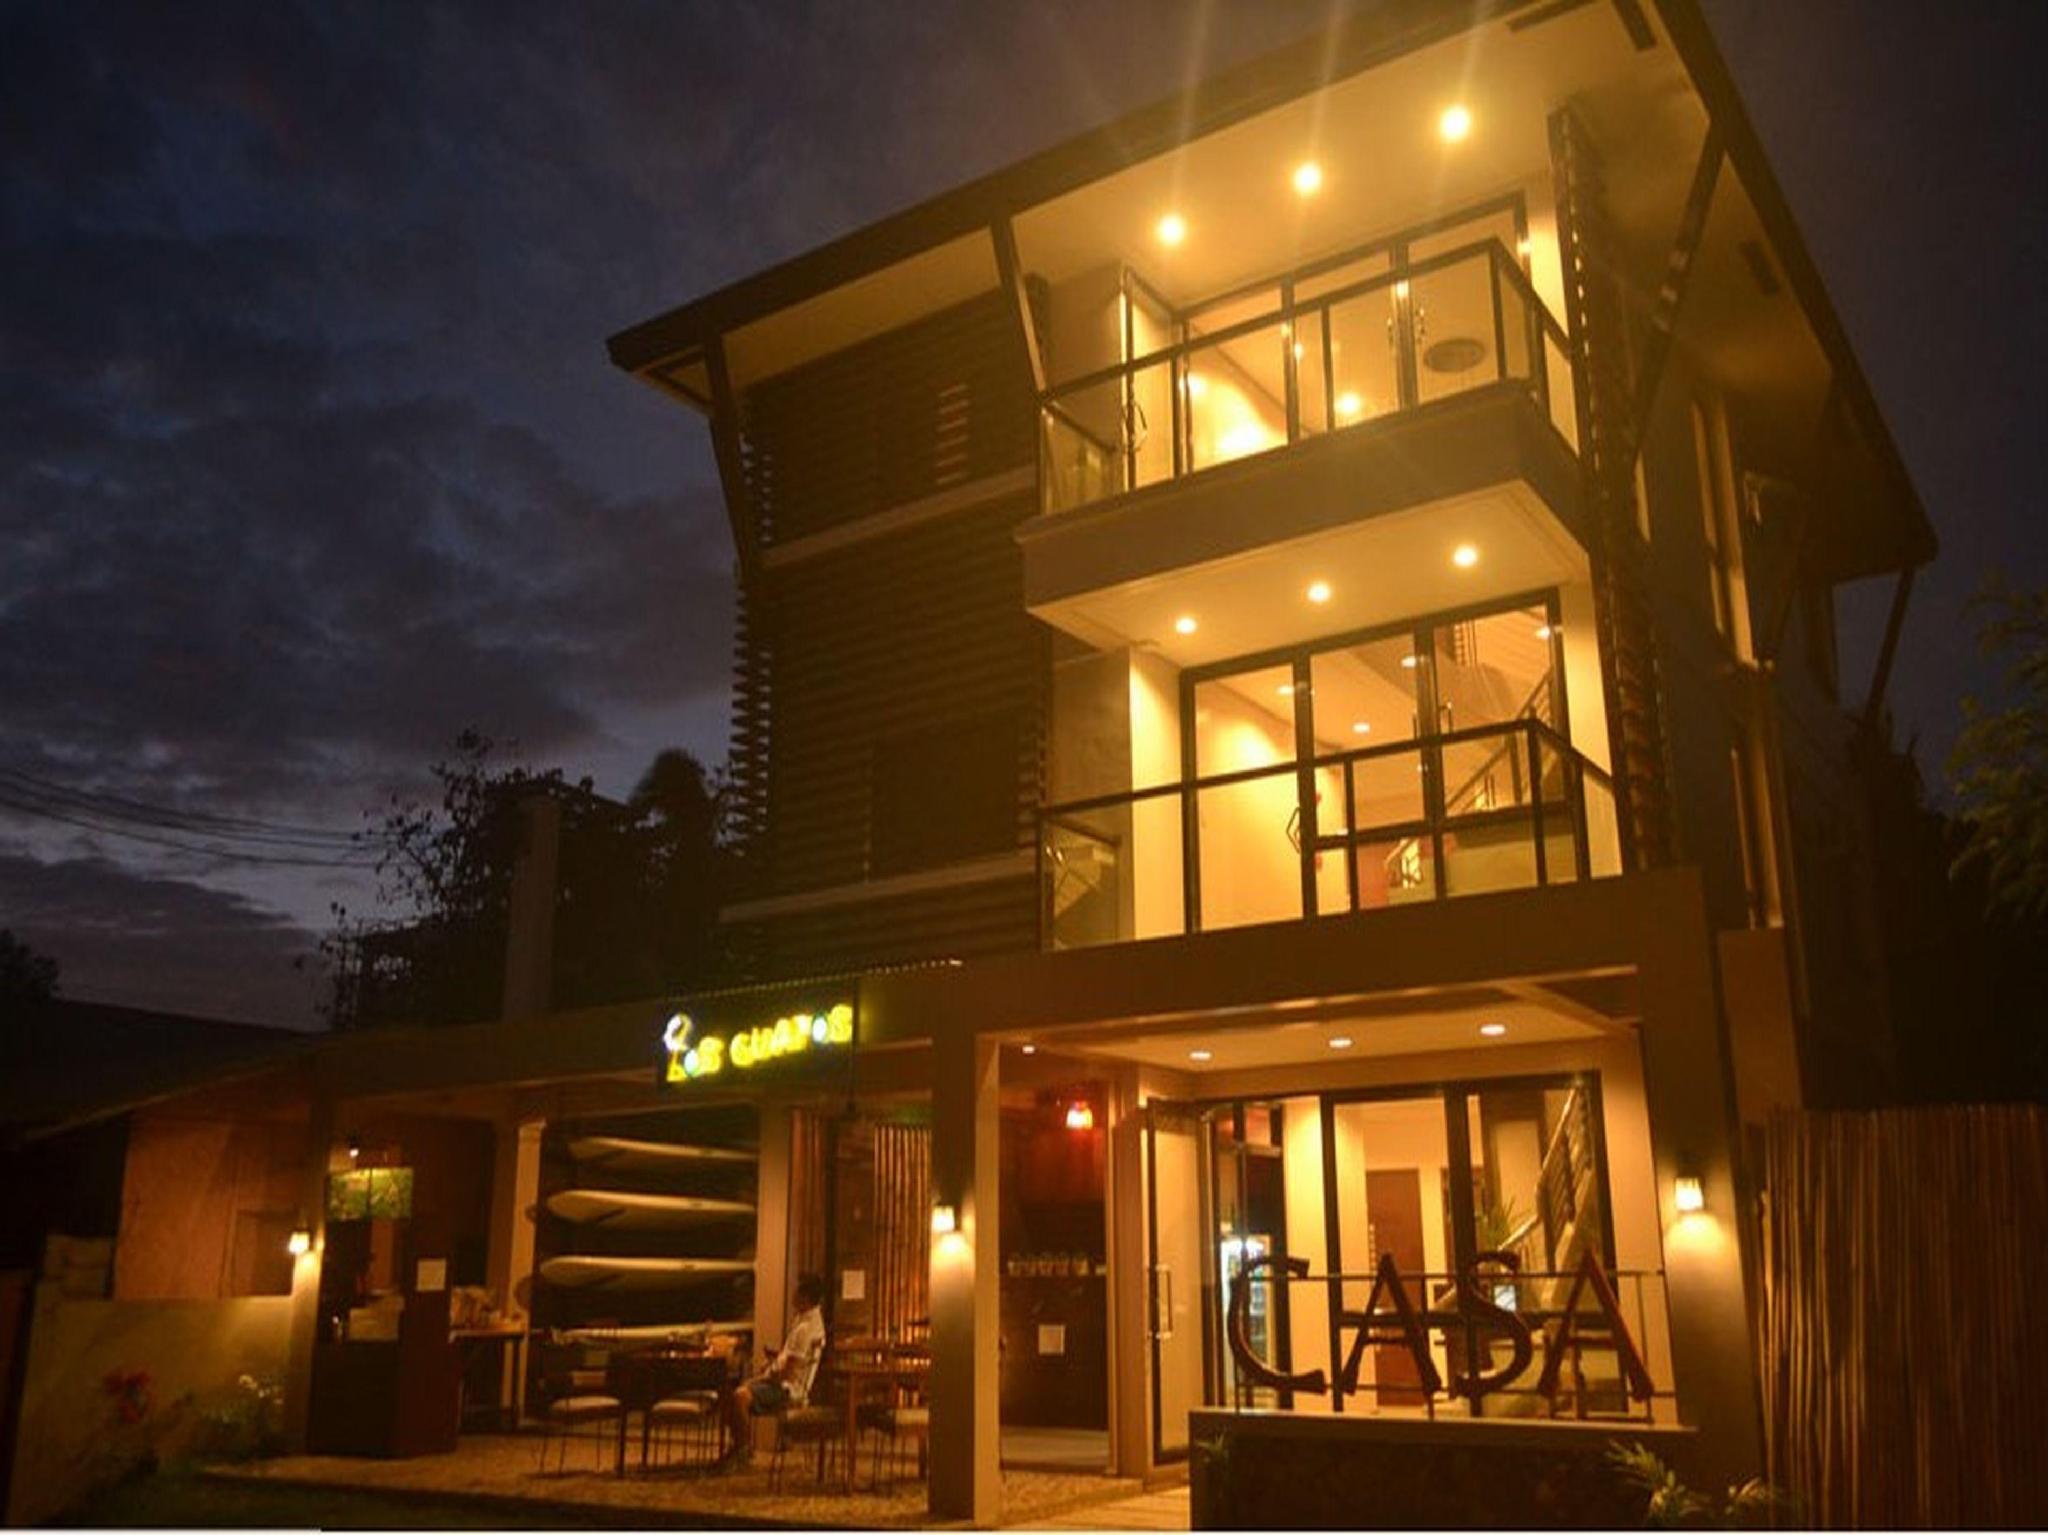 🌍 Coron Casa Hotel - Hotel/Accommodation (Agoda) in Coron ...